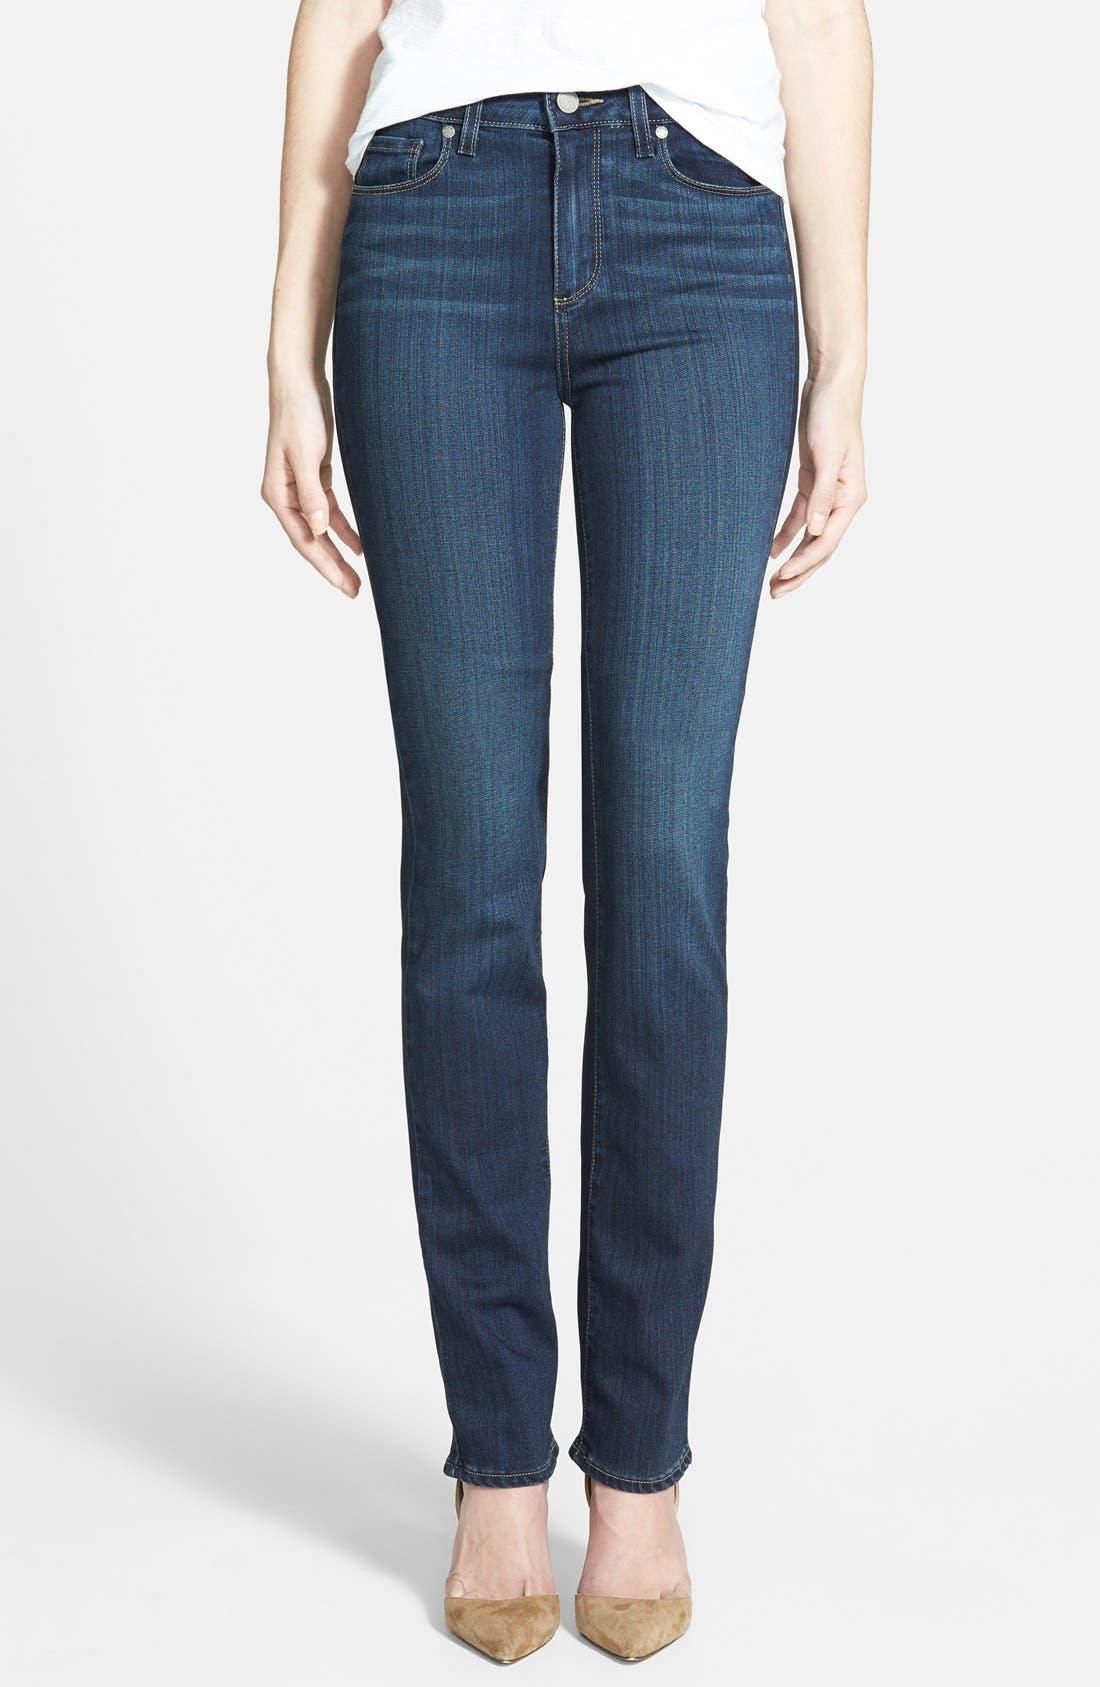 Alternate Image 1 Selected - PAIGE 'Transcend - Hoxton' High Rise Straight Leg Jeans (Nottingham Blue)